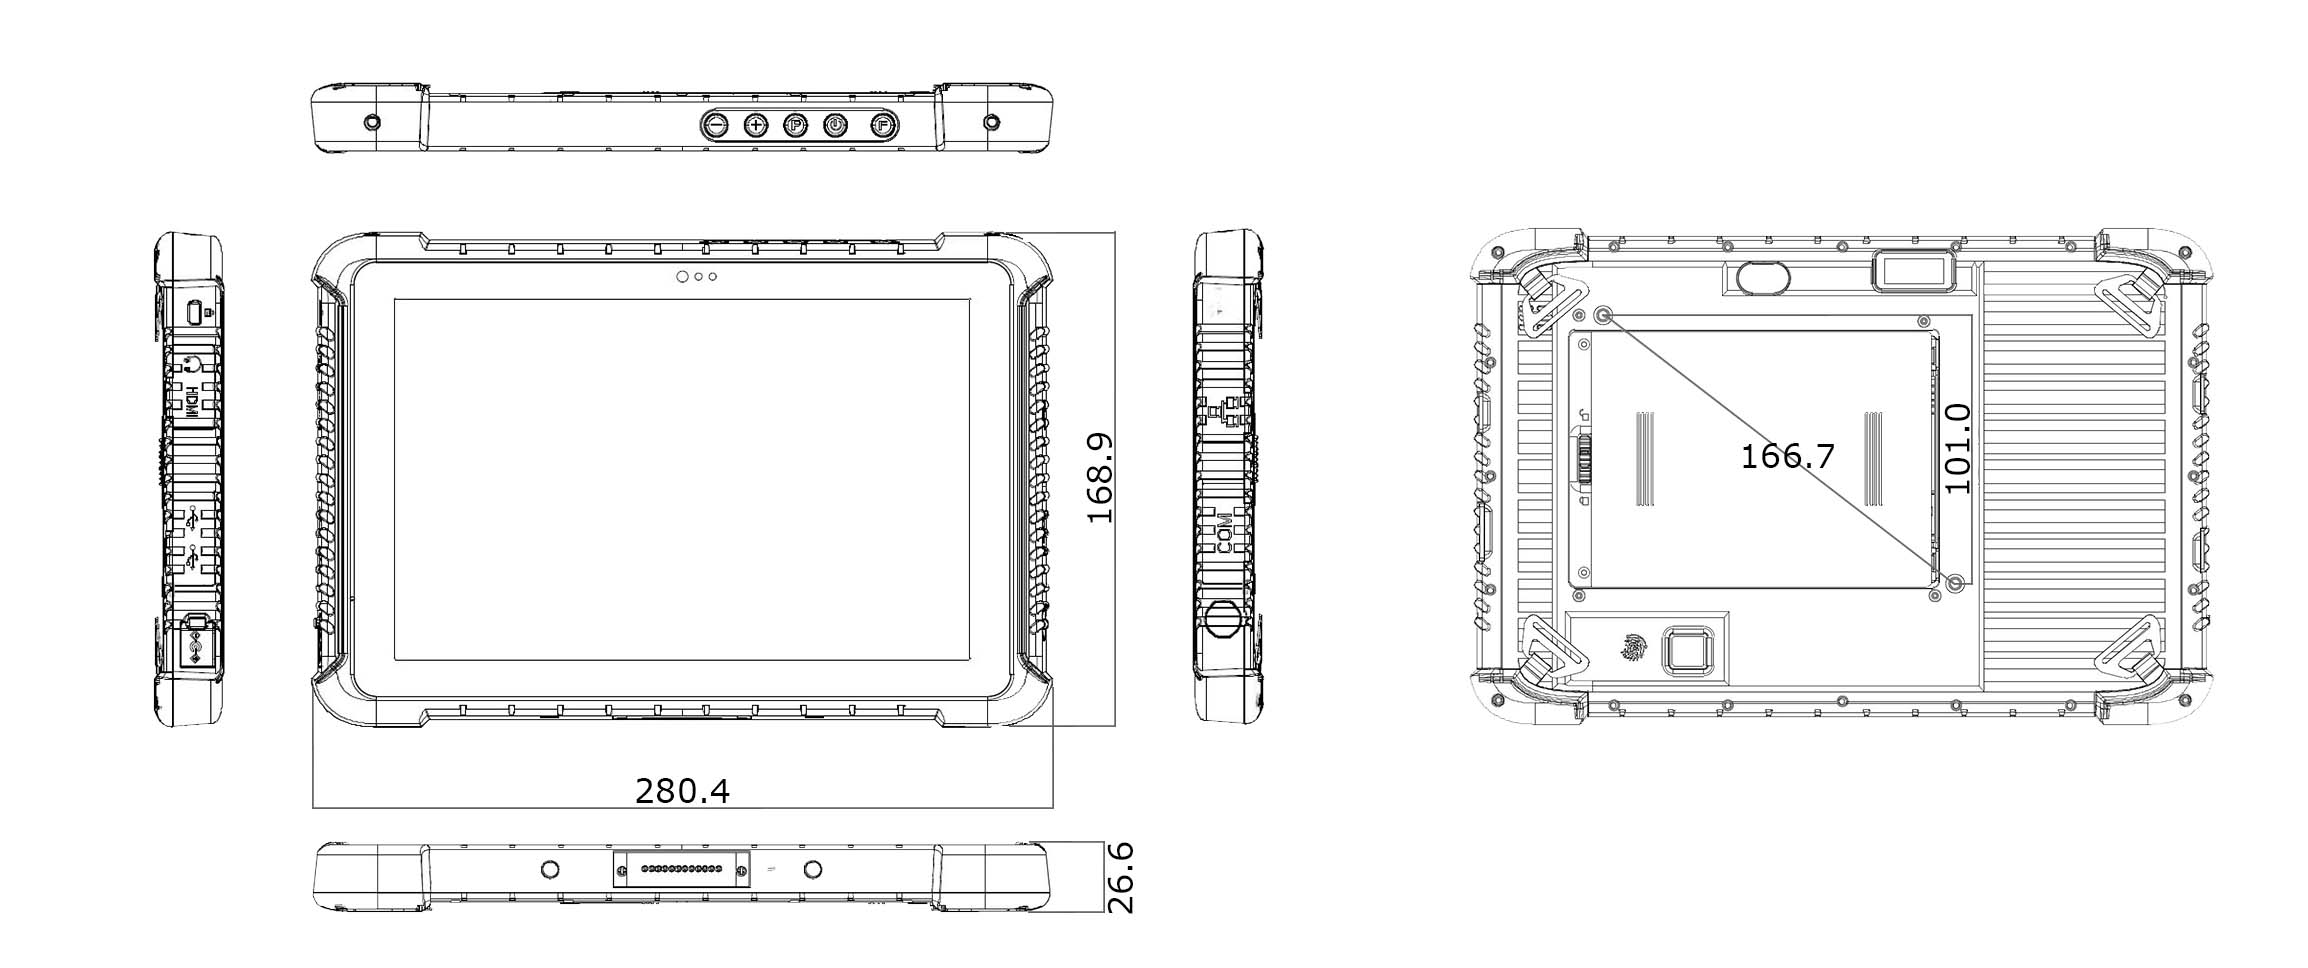 TRT-Q5380-10 technical drawing